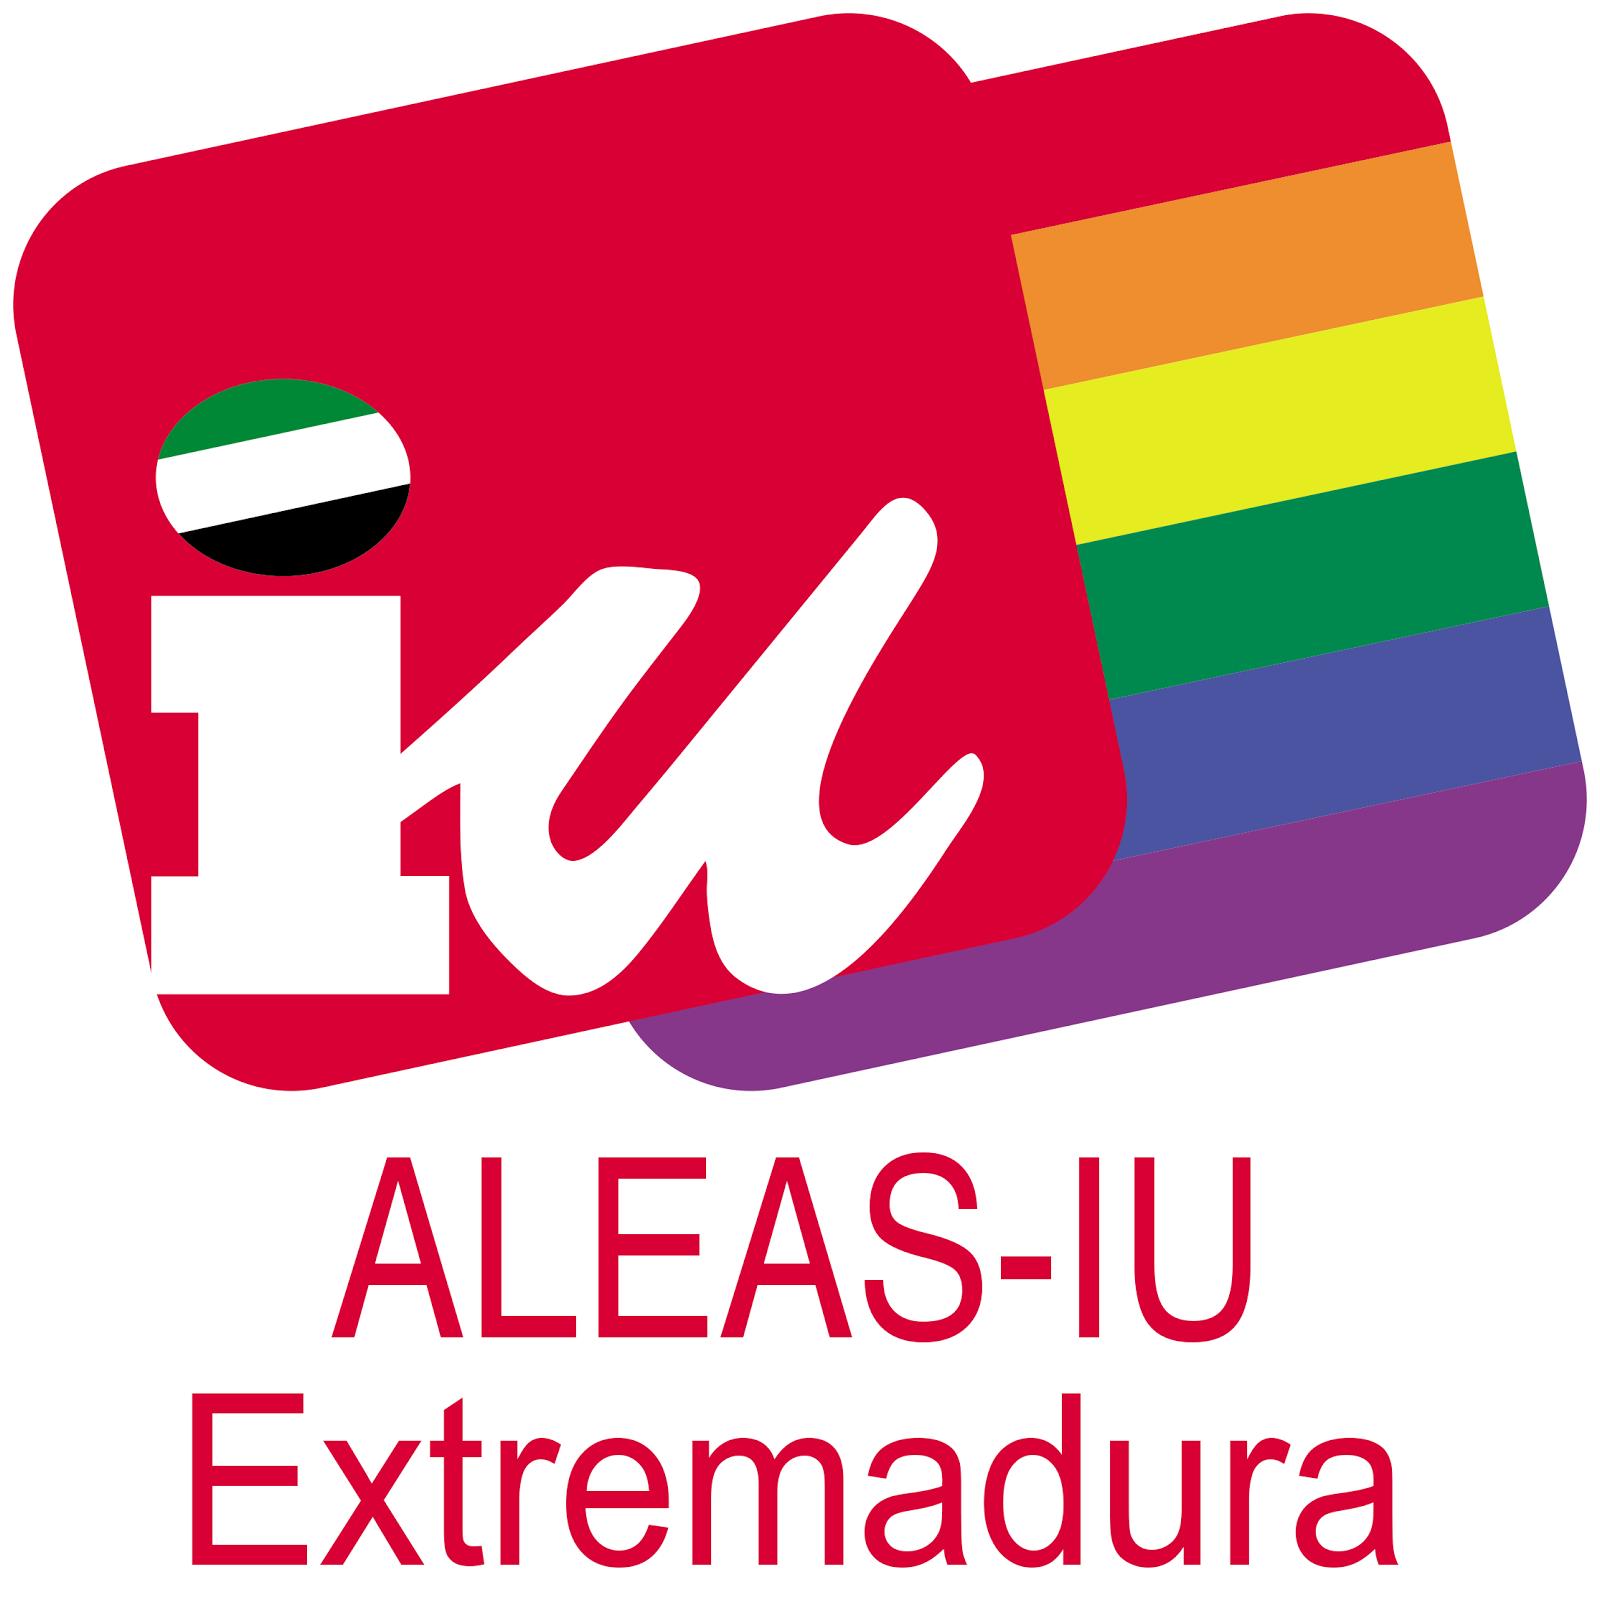 ALEAS-IU Extremadura